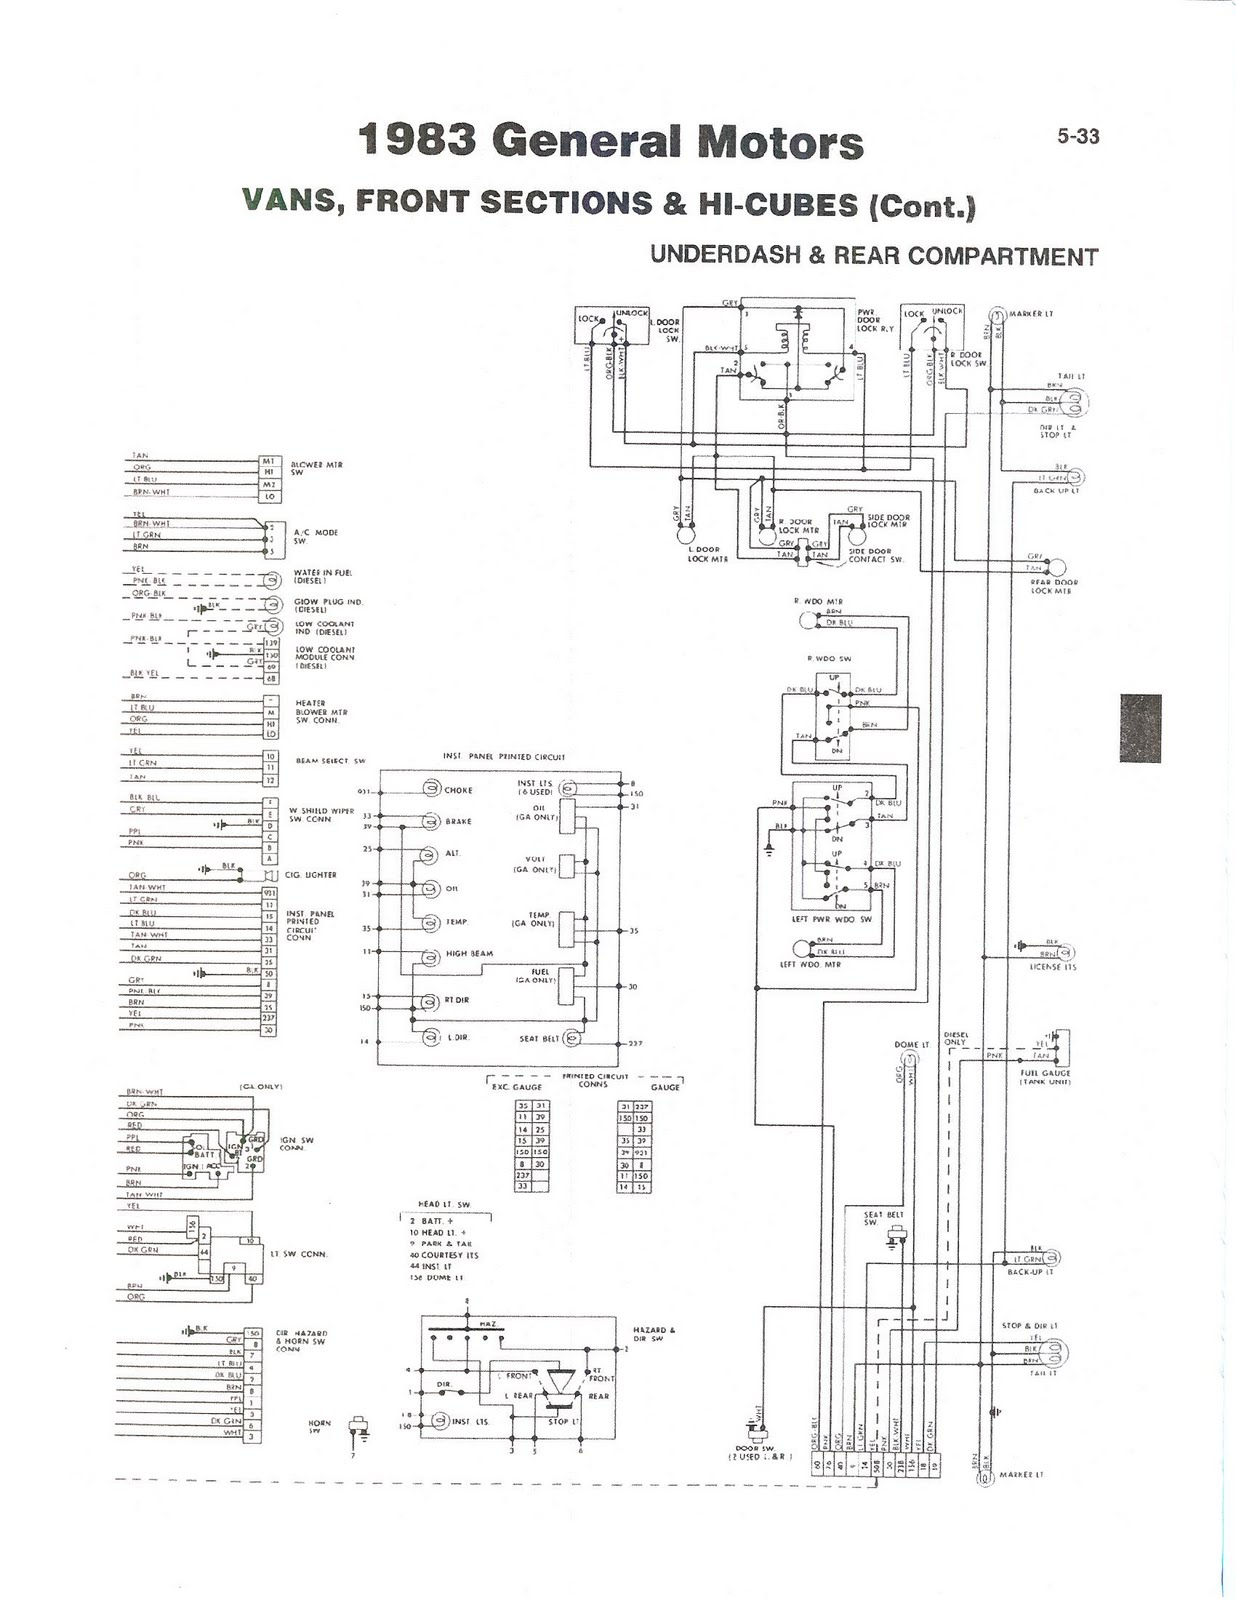 1992 bounder motorhome wiring diagram - somurich.com 1992 fleetwood bounder wiring diagram